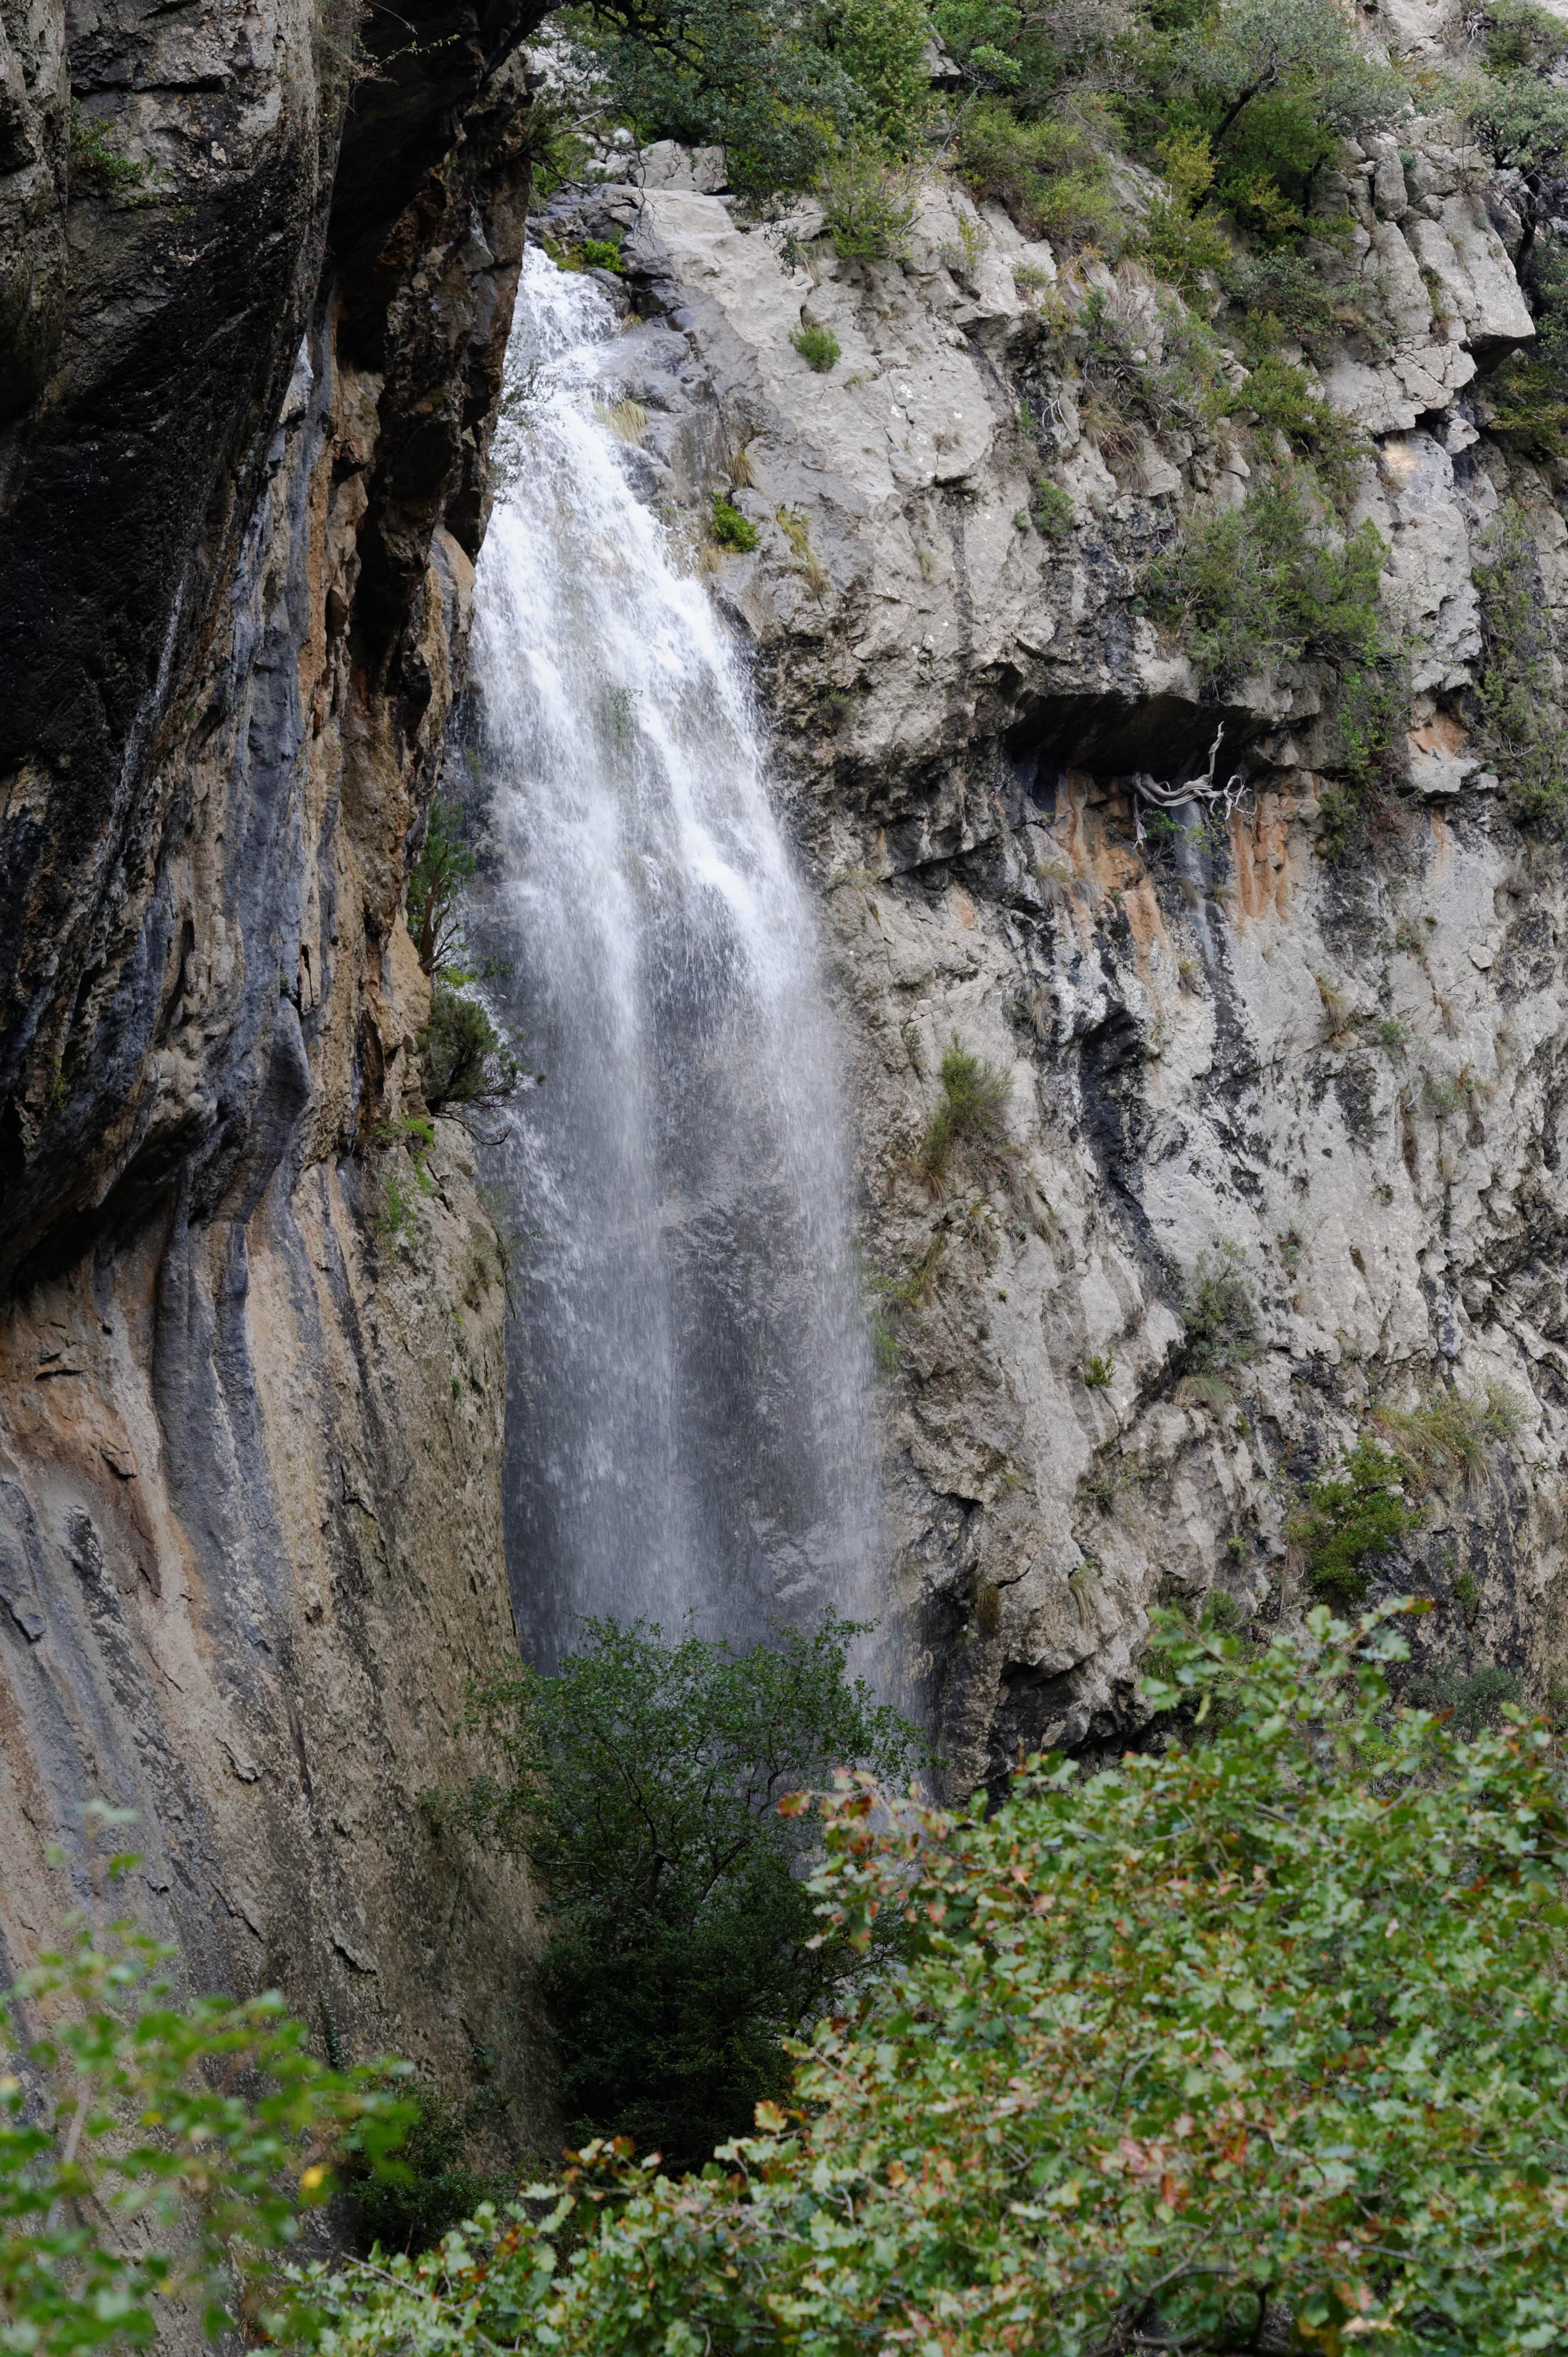 4394_vers Benasque (Aragon)